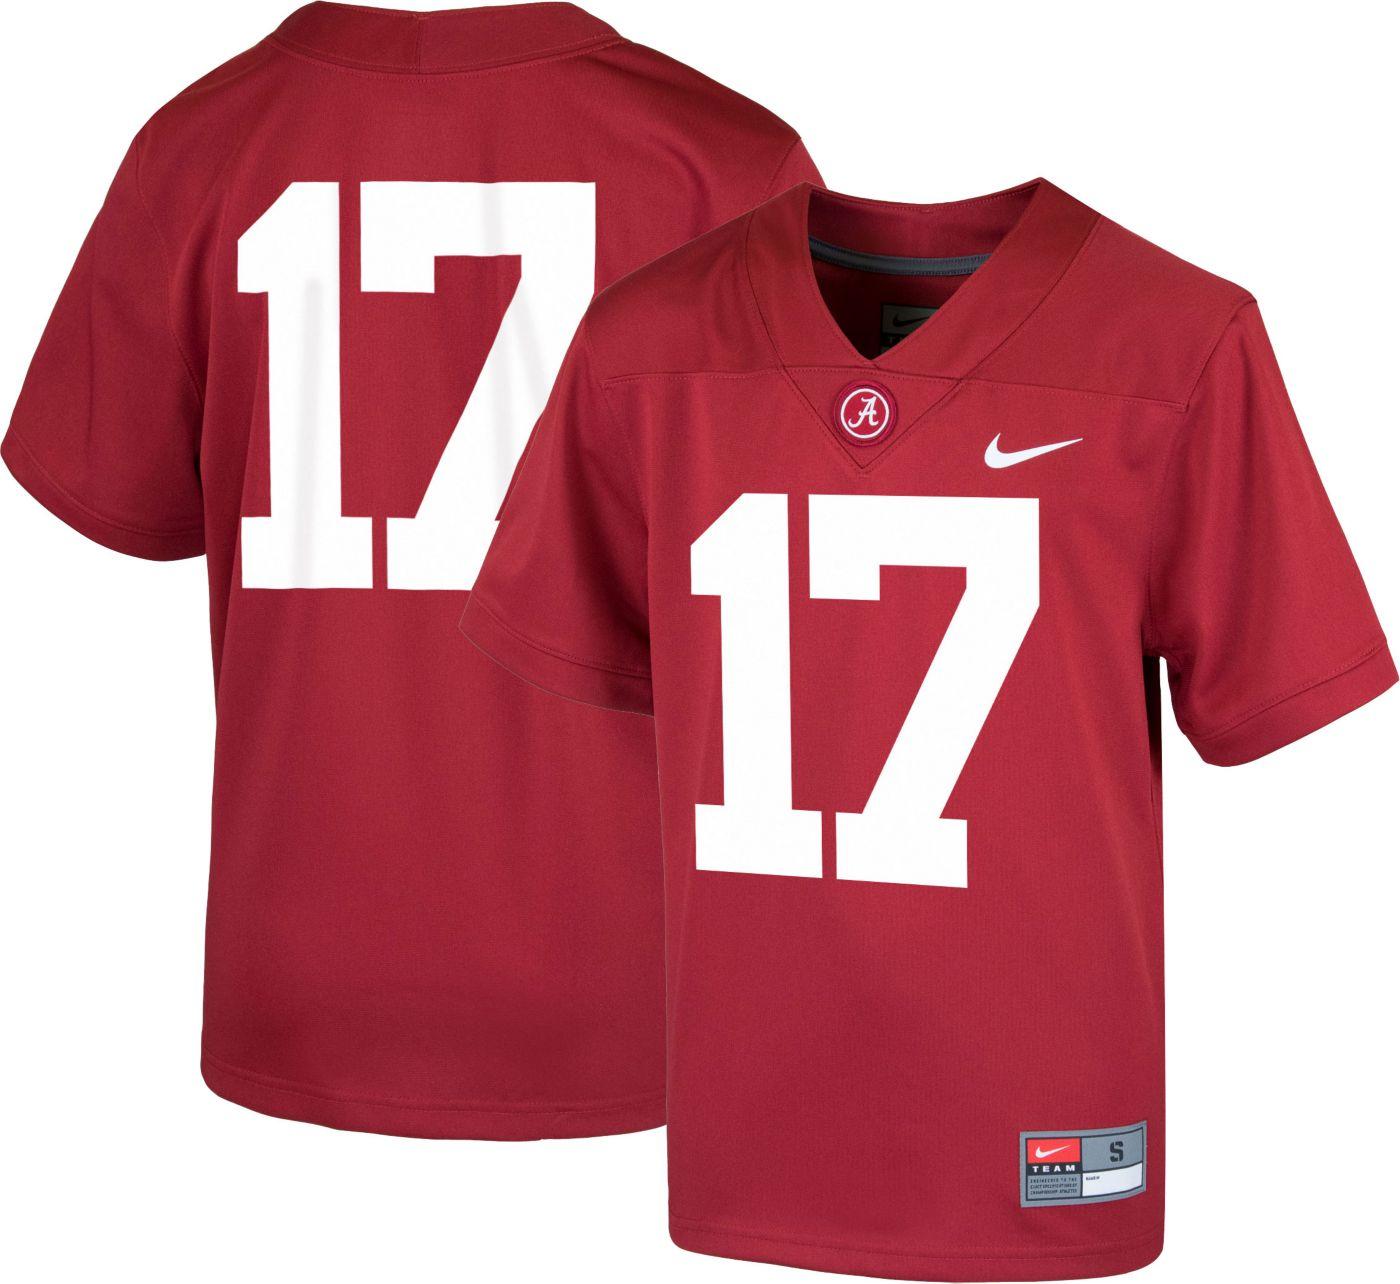 Nike Youth Alabama Crimson Tide #17 Crimson Game Football Jersey